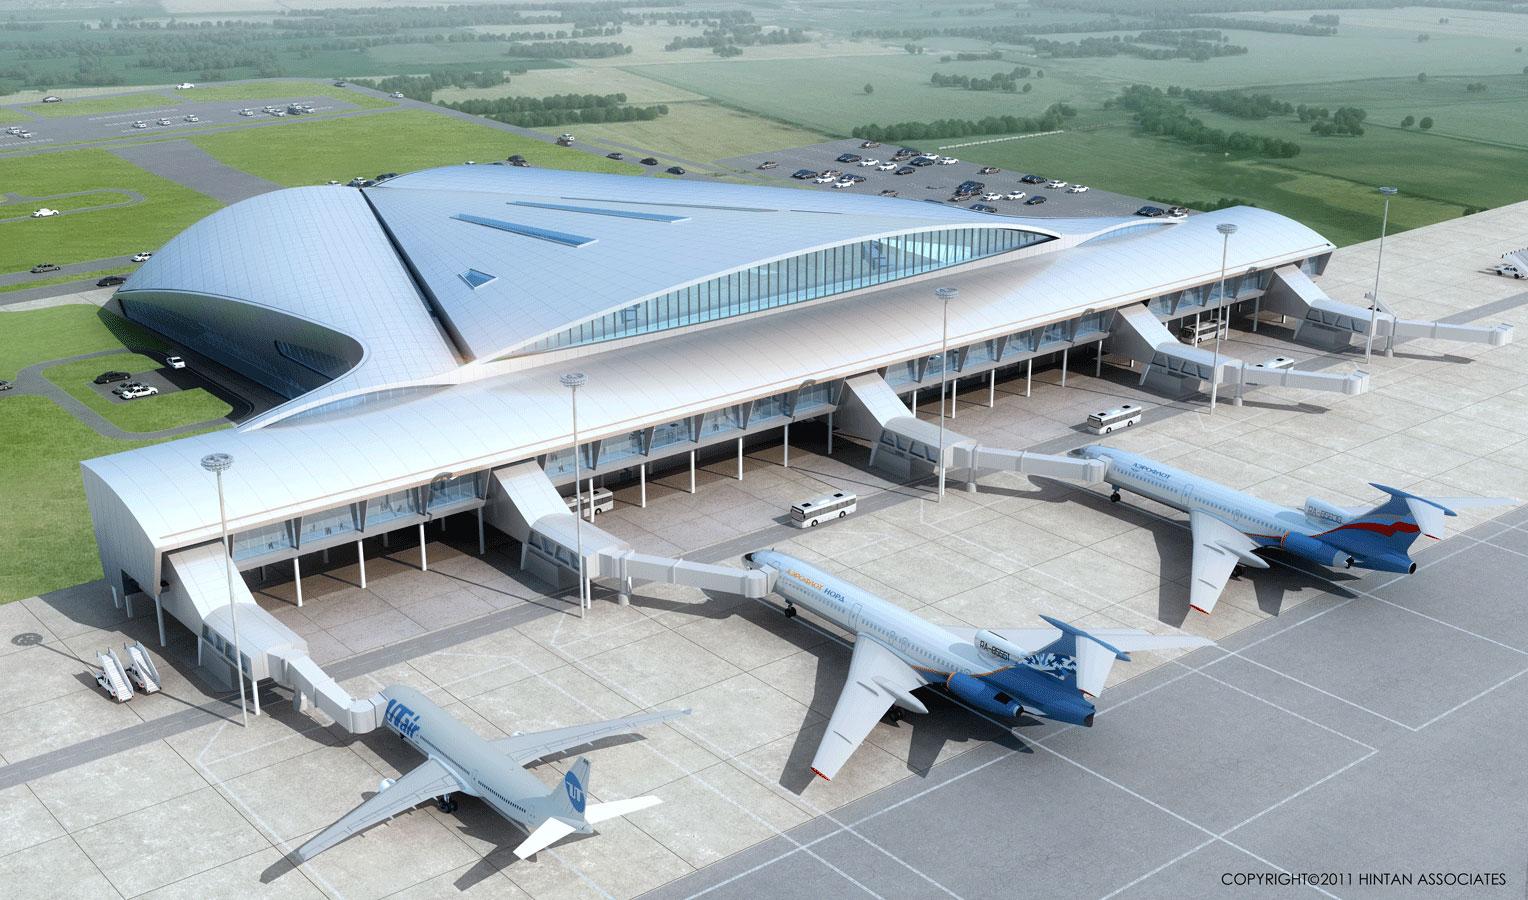 самара курумоч аэропорт фото